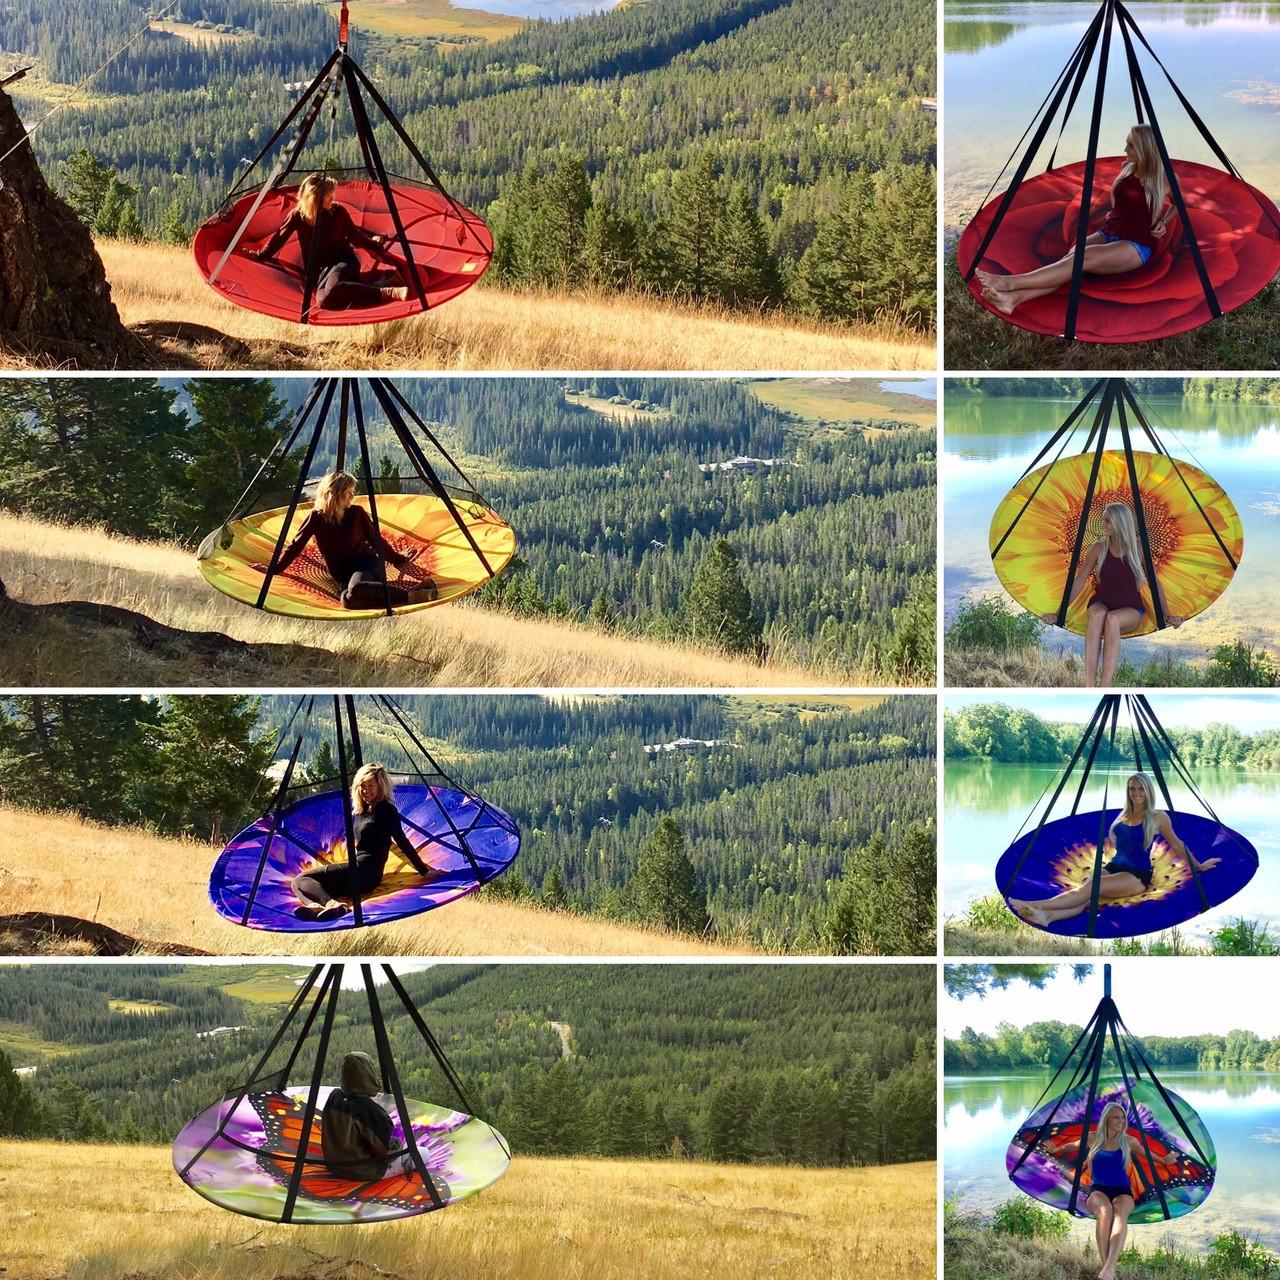 hanging hammock lounge chair air bag 7ft dia blooming flowerhouse price 398 75 image 1